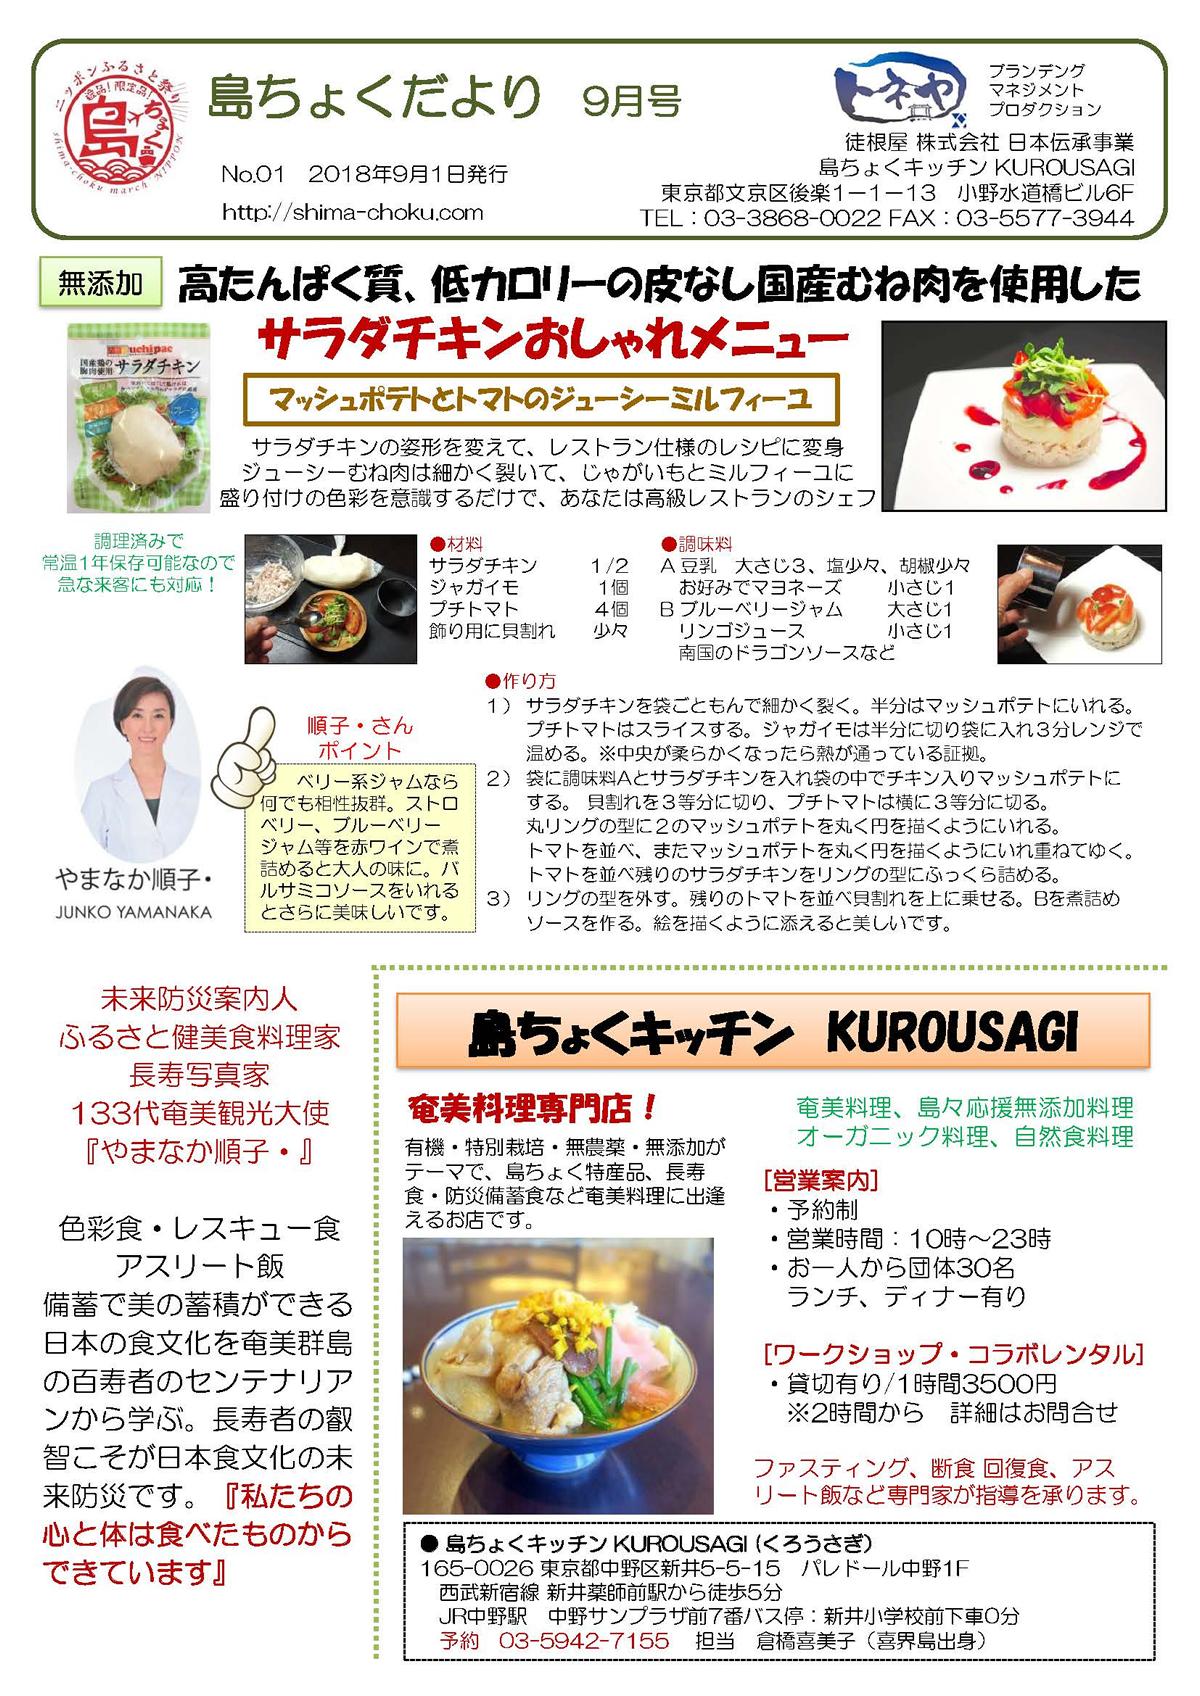 https://shima-choku.com/articles/images/20180901vol001a.jpg